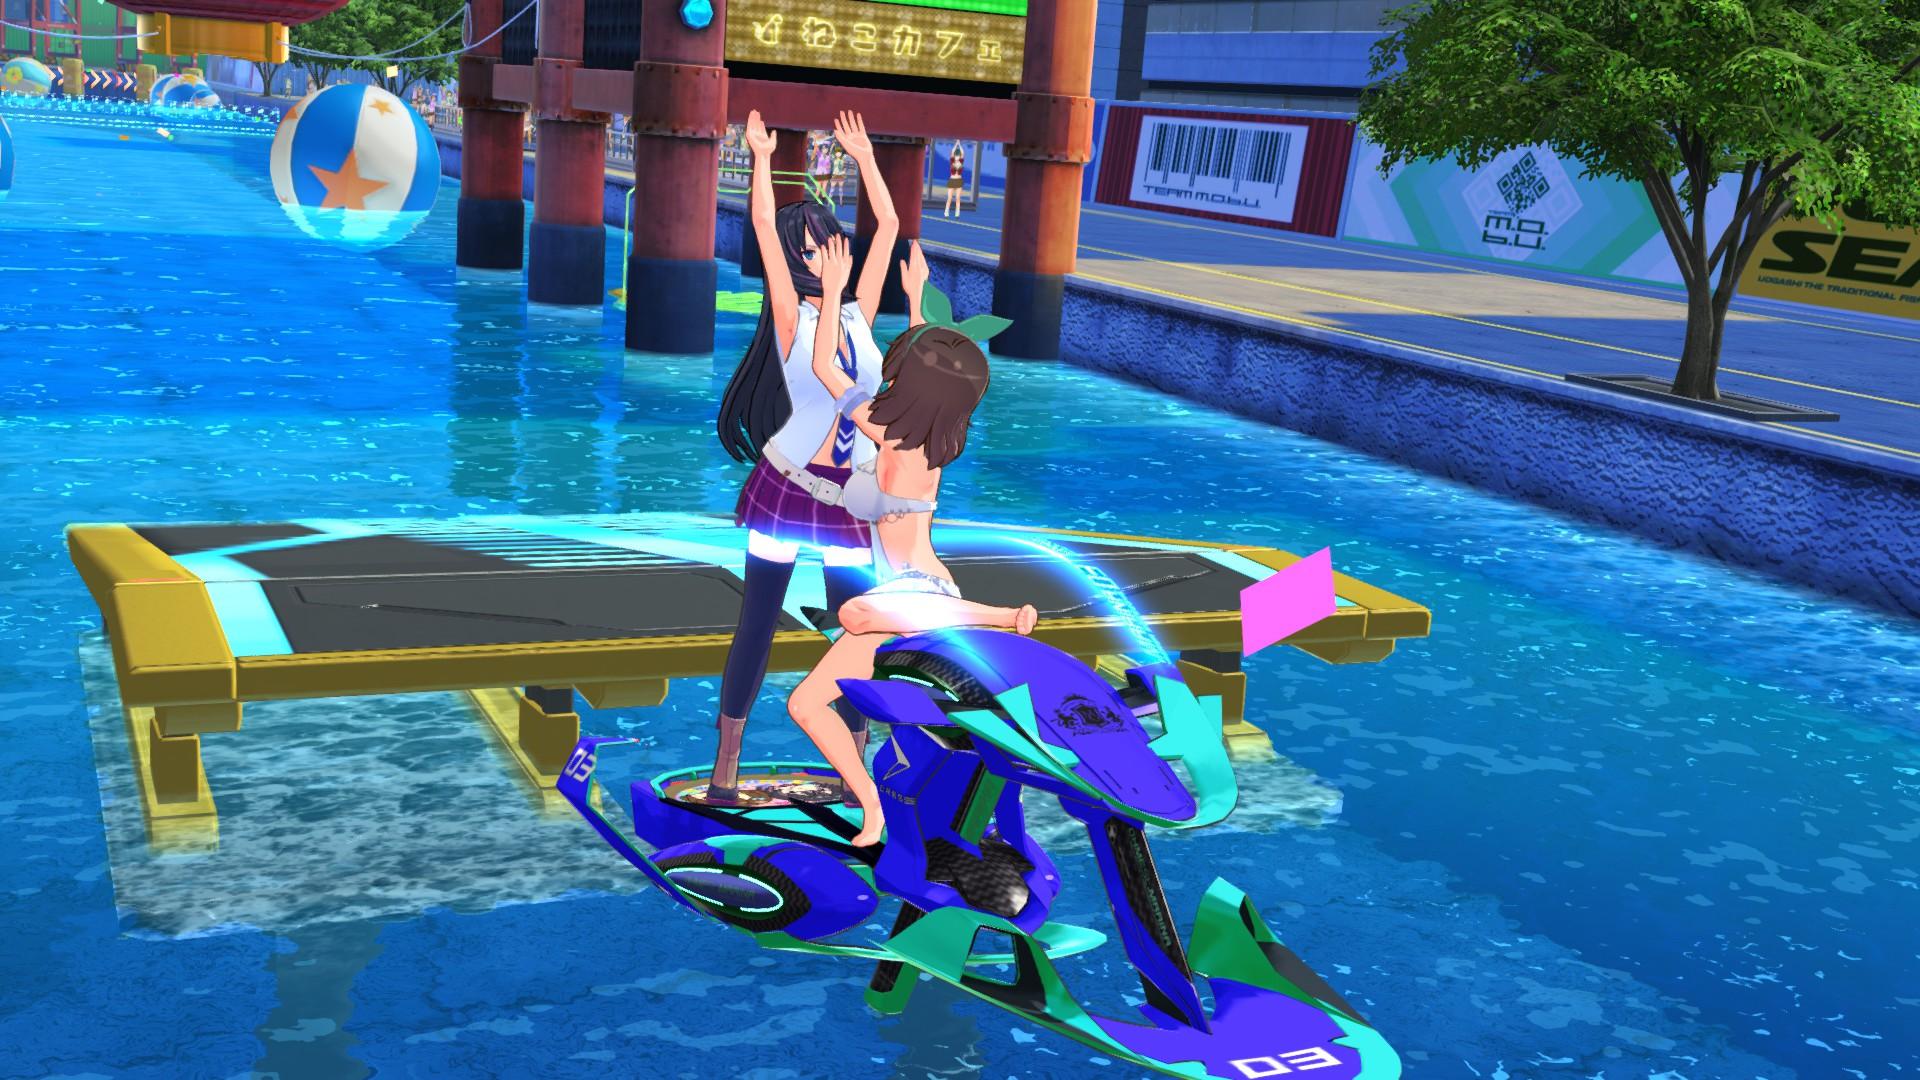 Kandagawa Jet Girls review for the PC. 8Bit/Digi